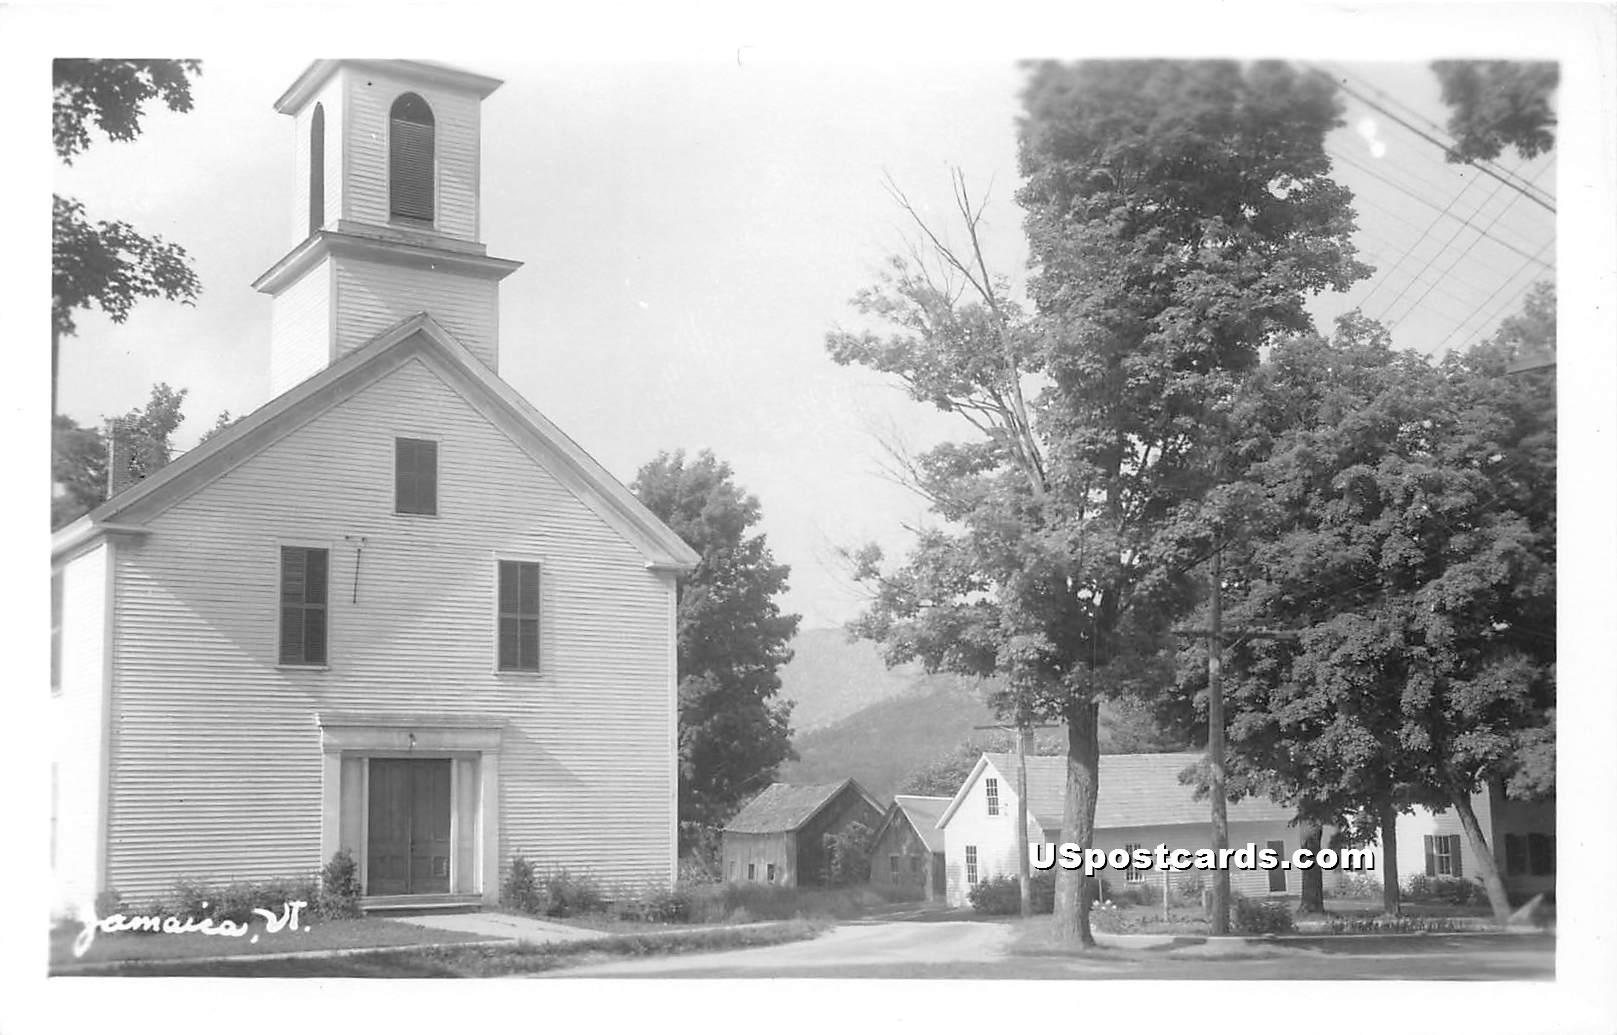 Church - Jamaica, Vermont VT Postcard